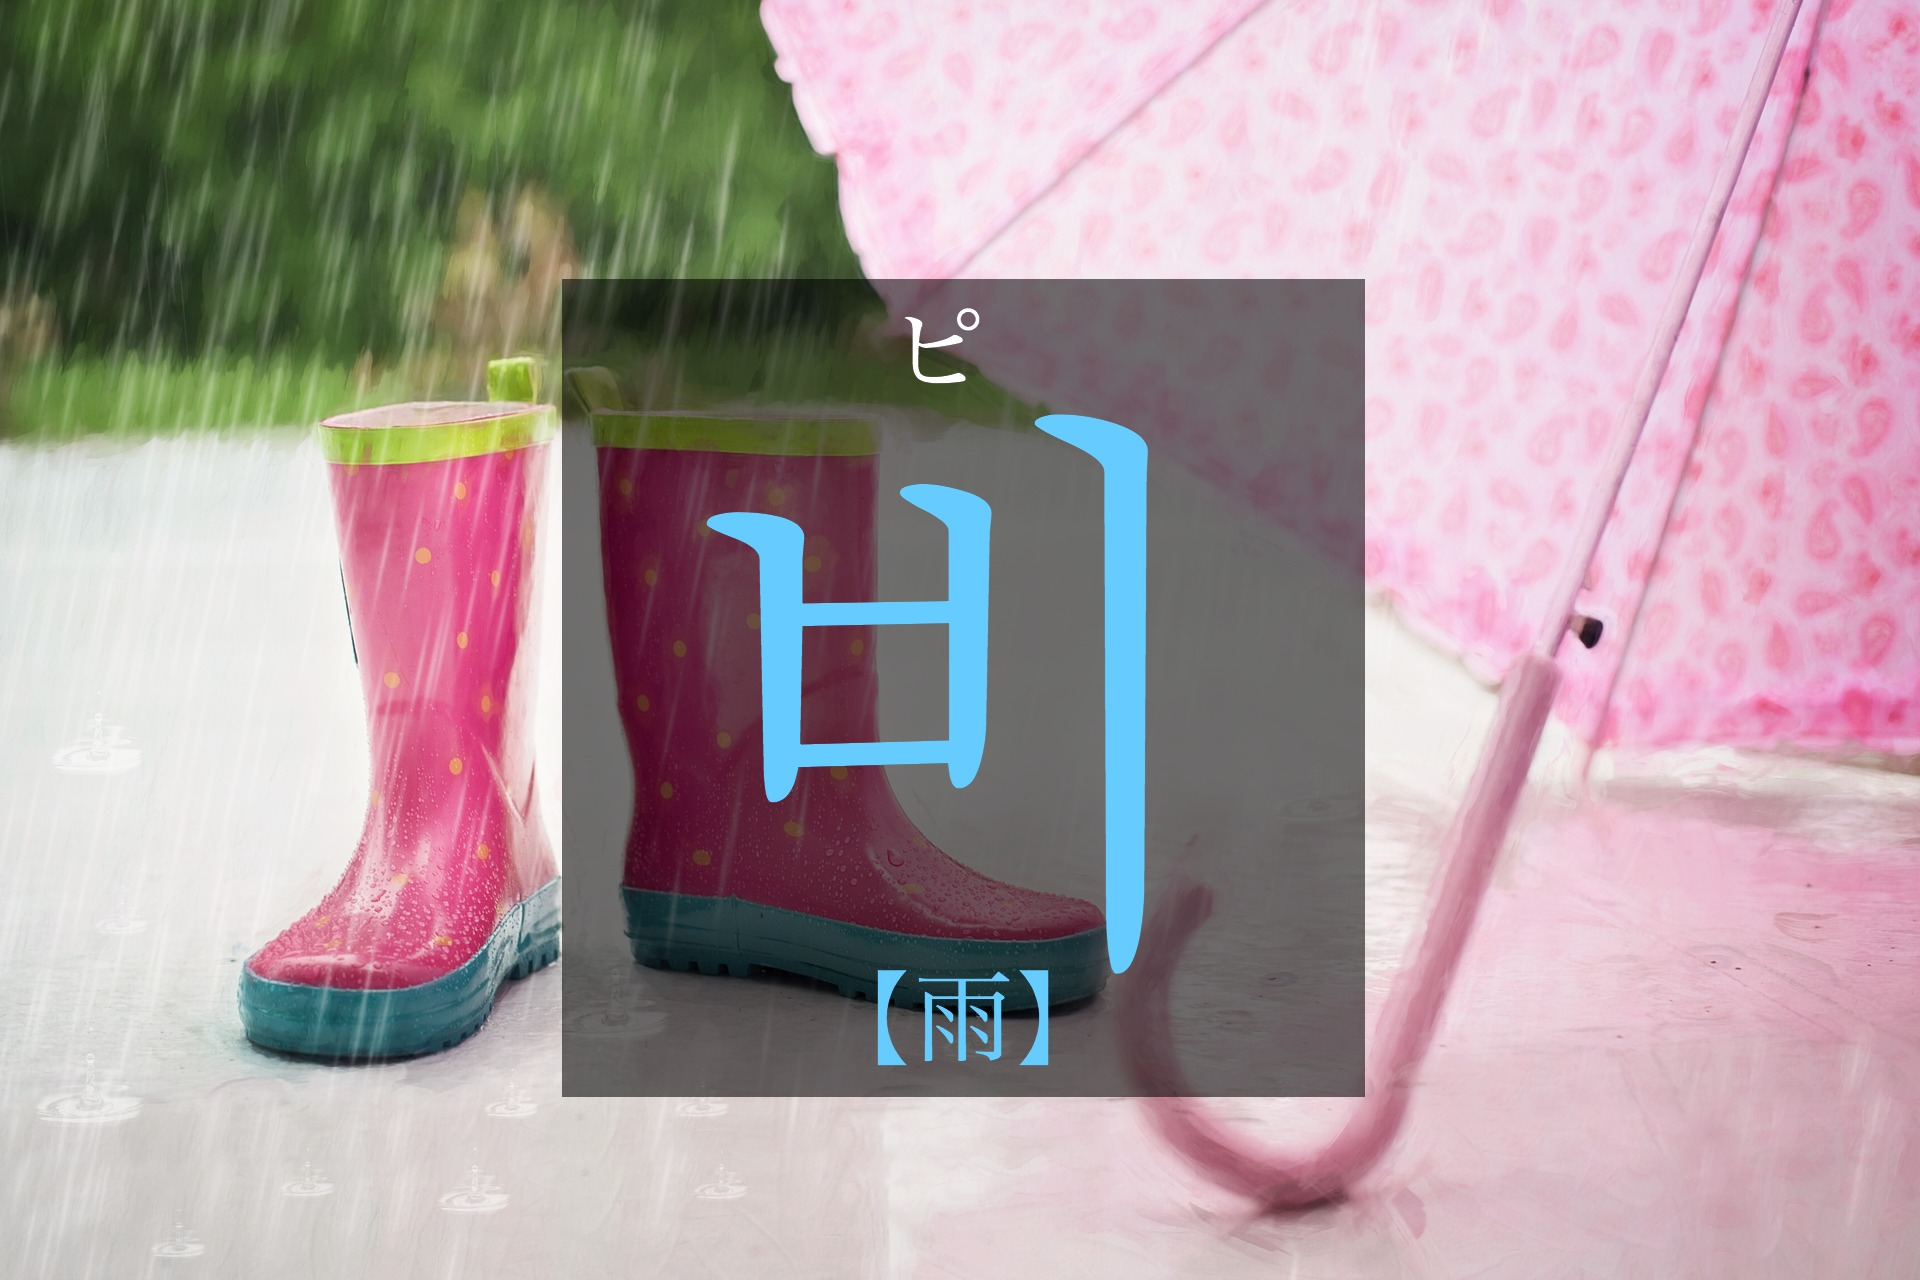 koreanword-rain